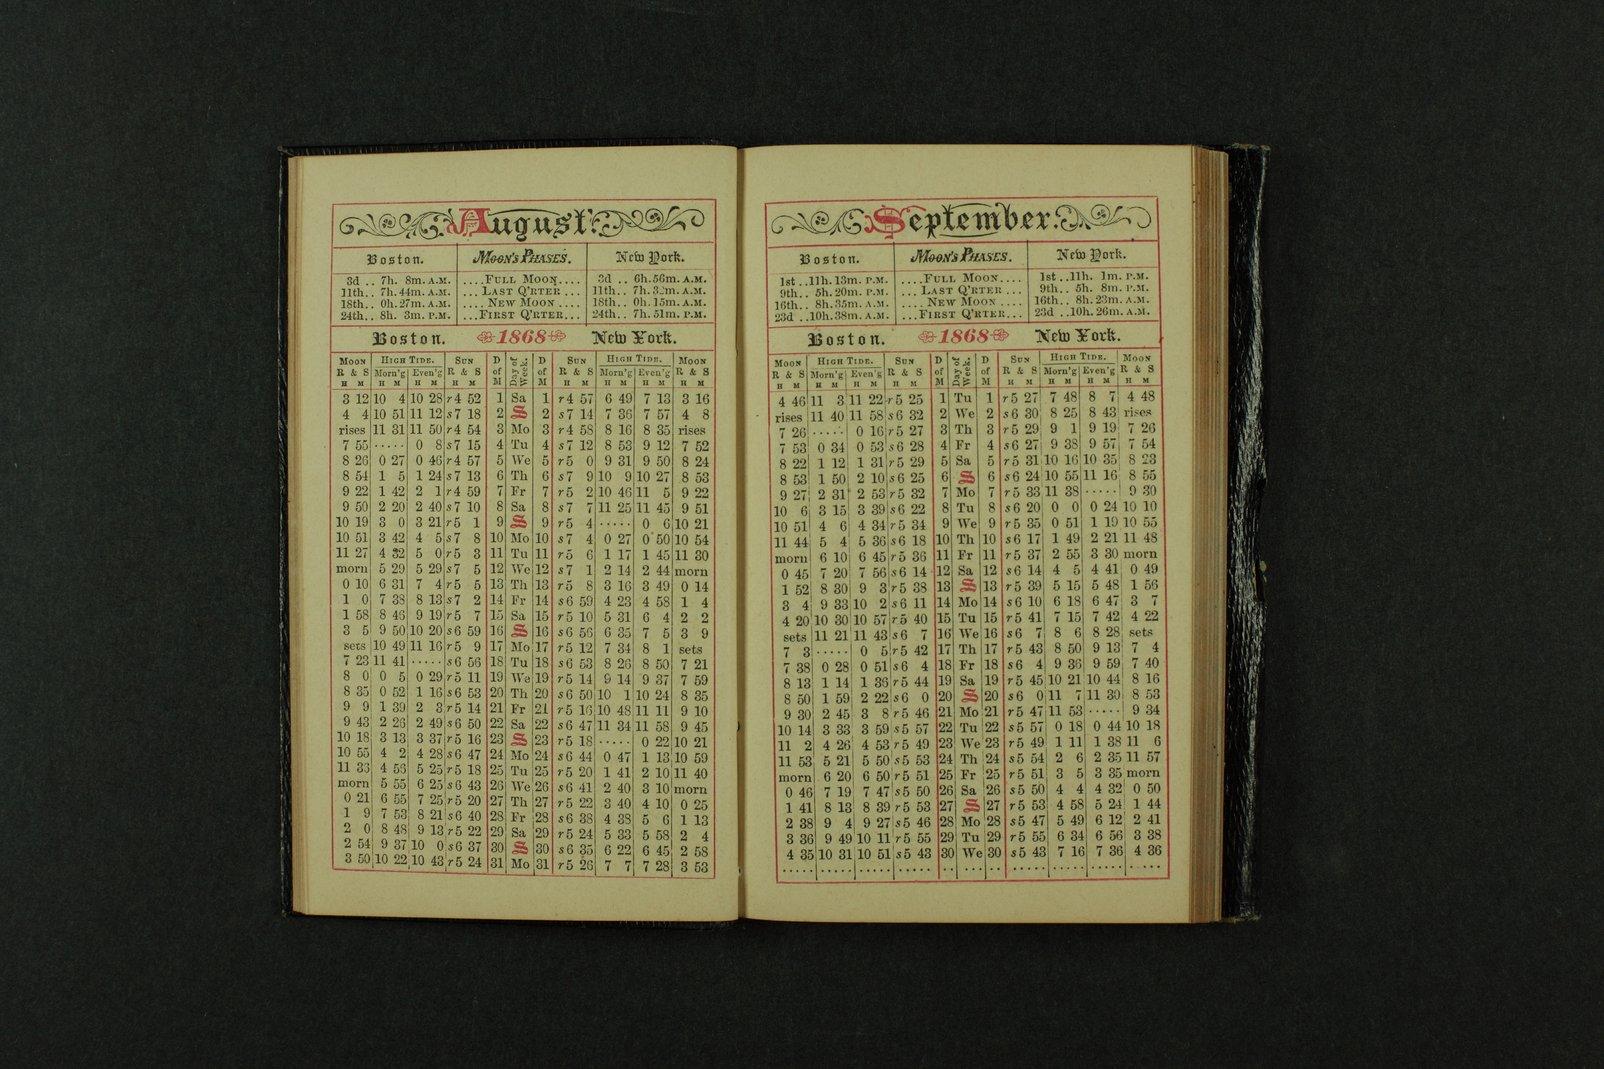 Isaac Tichenor Goodnow diary - 13